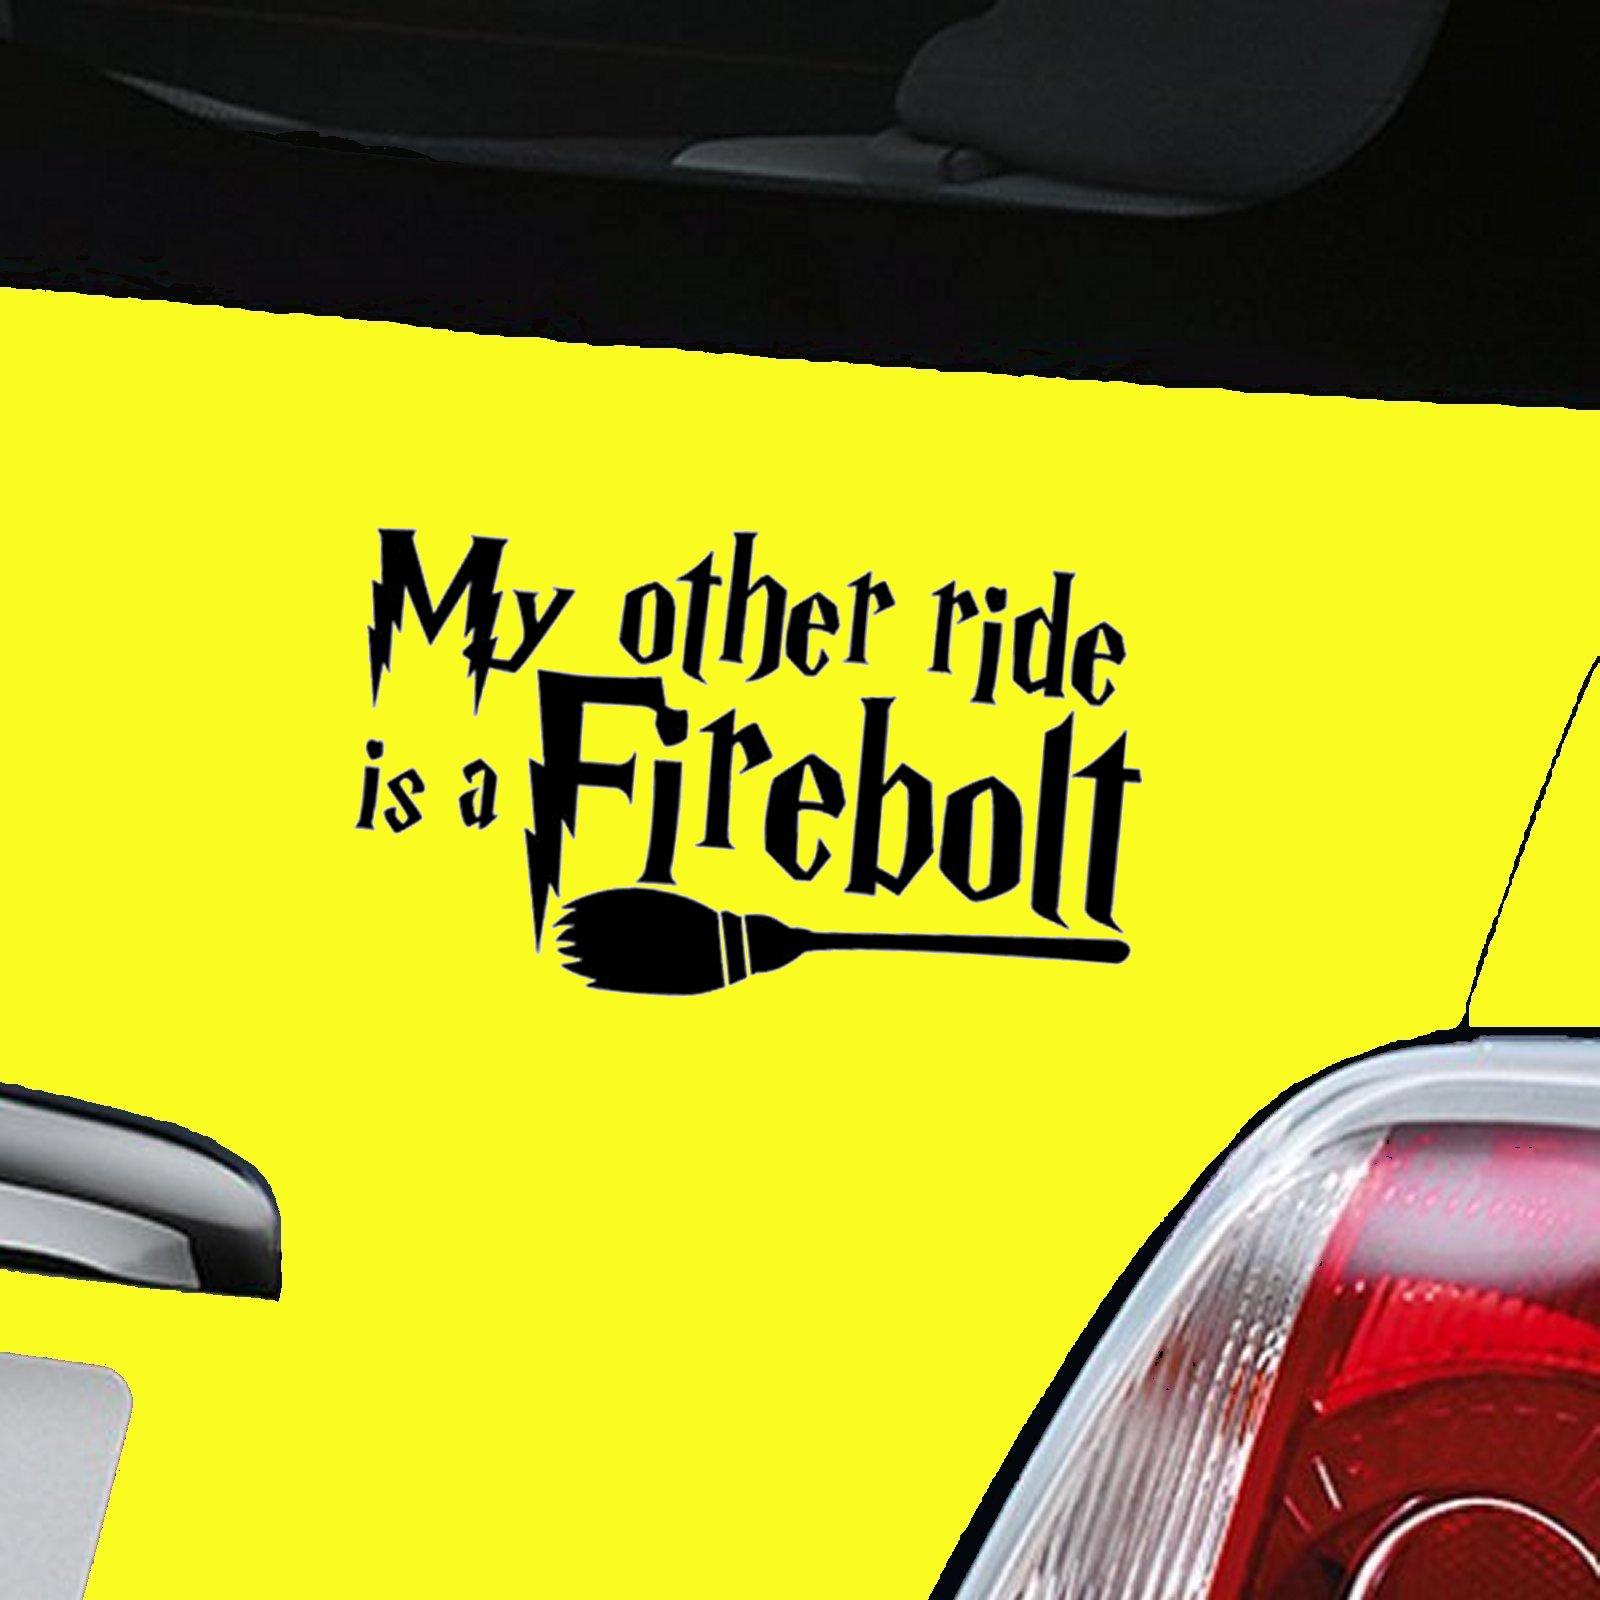 used car window sticker template - harry potter firebolt black car decal window sticker